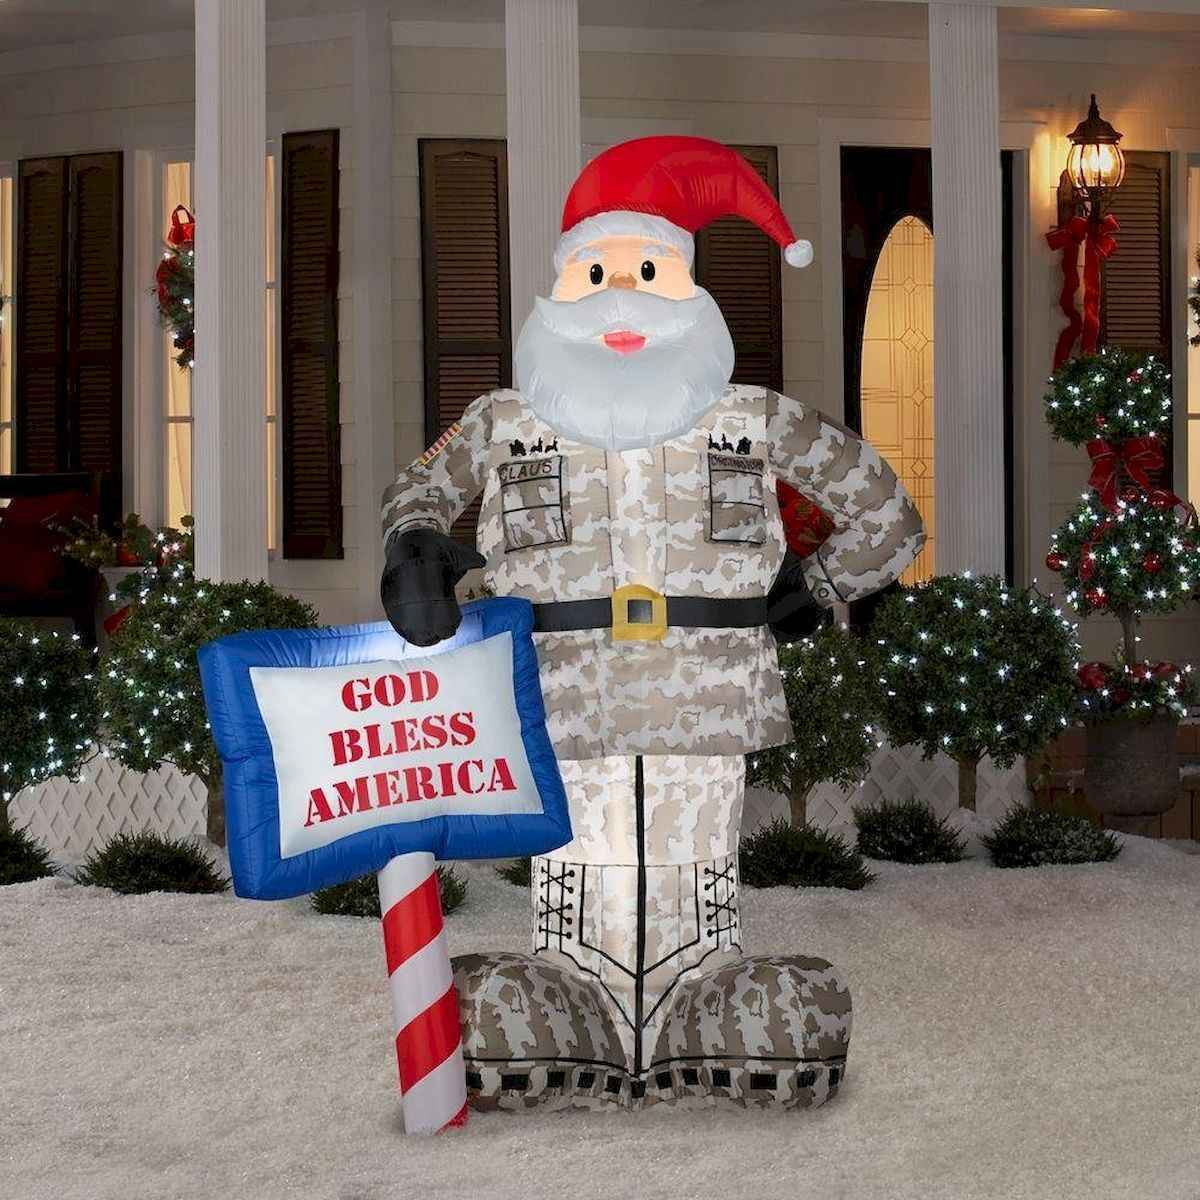 40 amazing outdoor christmas decorations ideas (6)